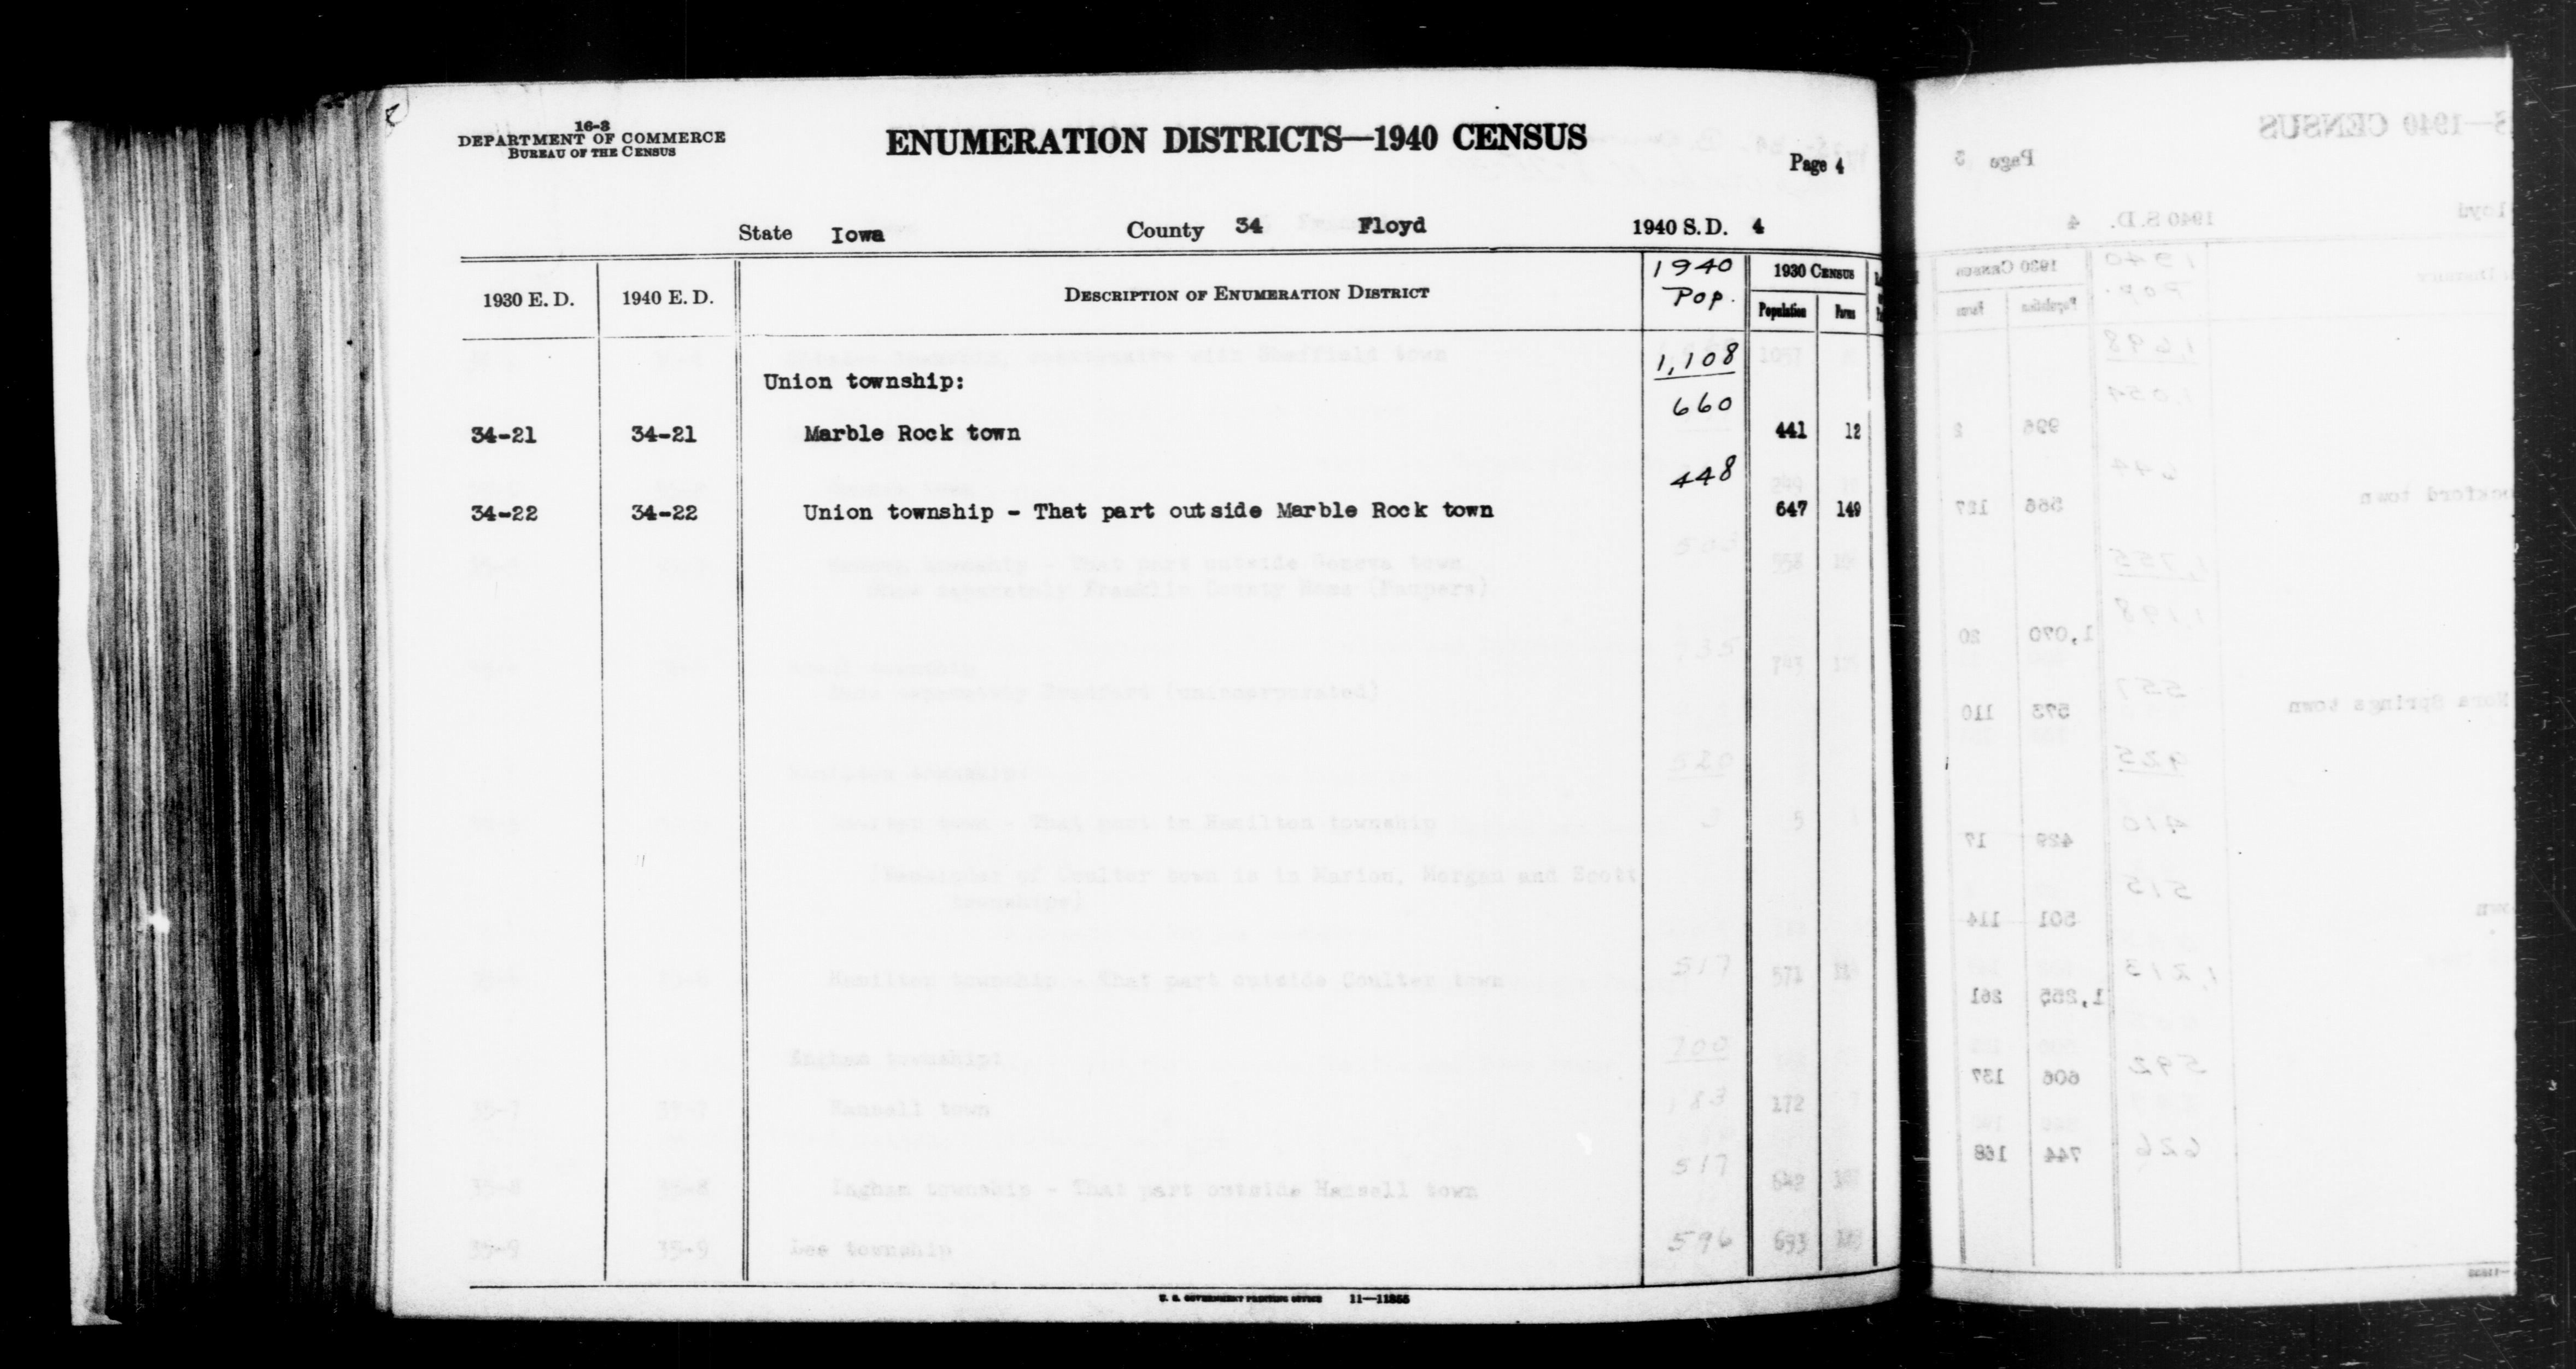 1940 Census Enumeration District Descriptions - Iowa - Floyd County - ED 34-21, ED 34-22